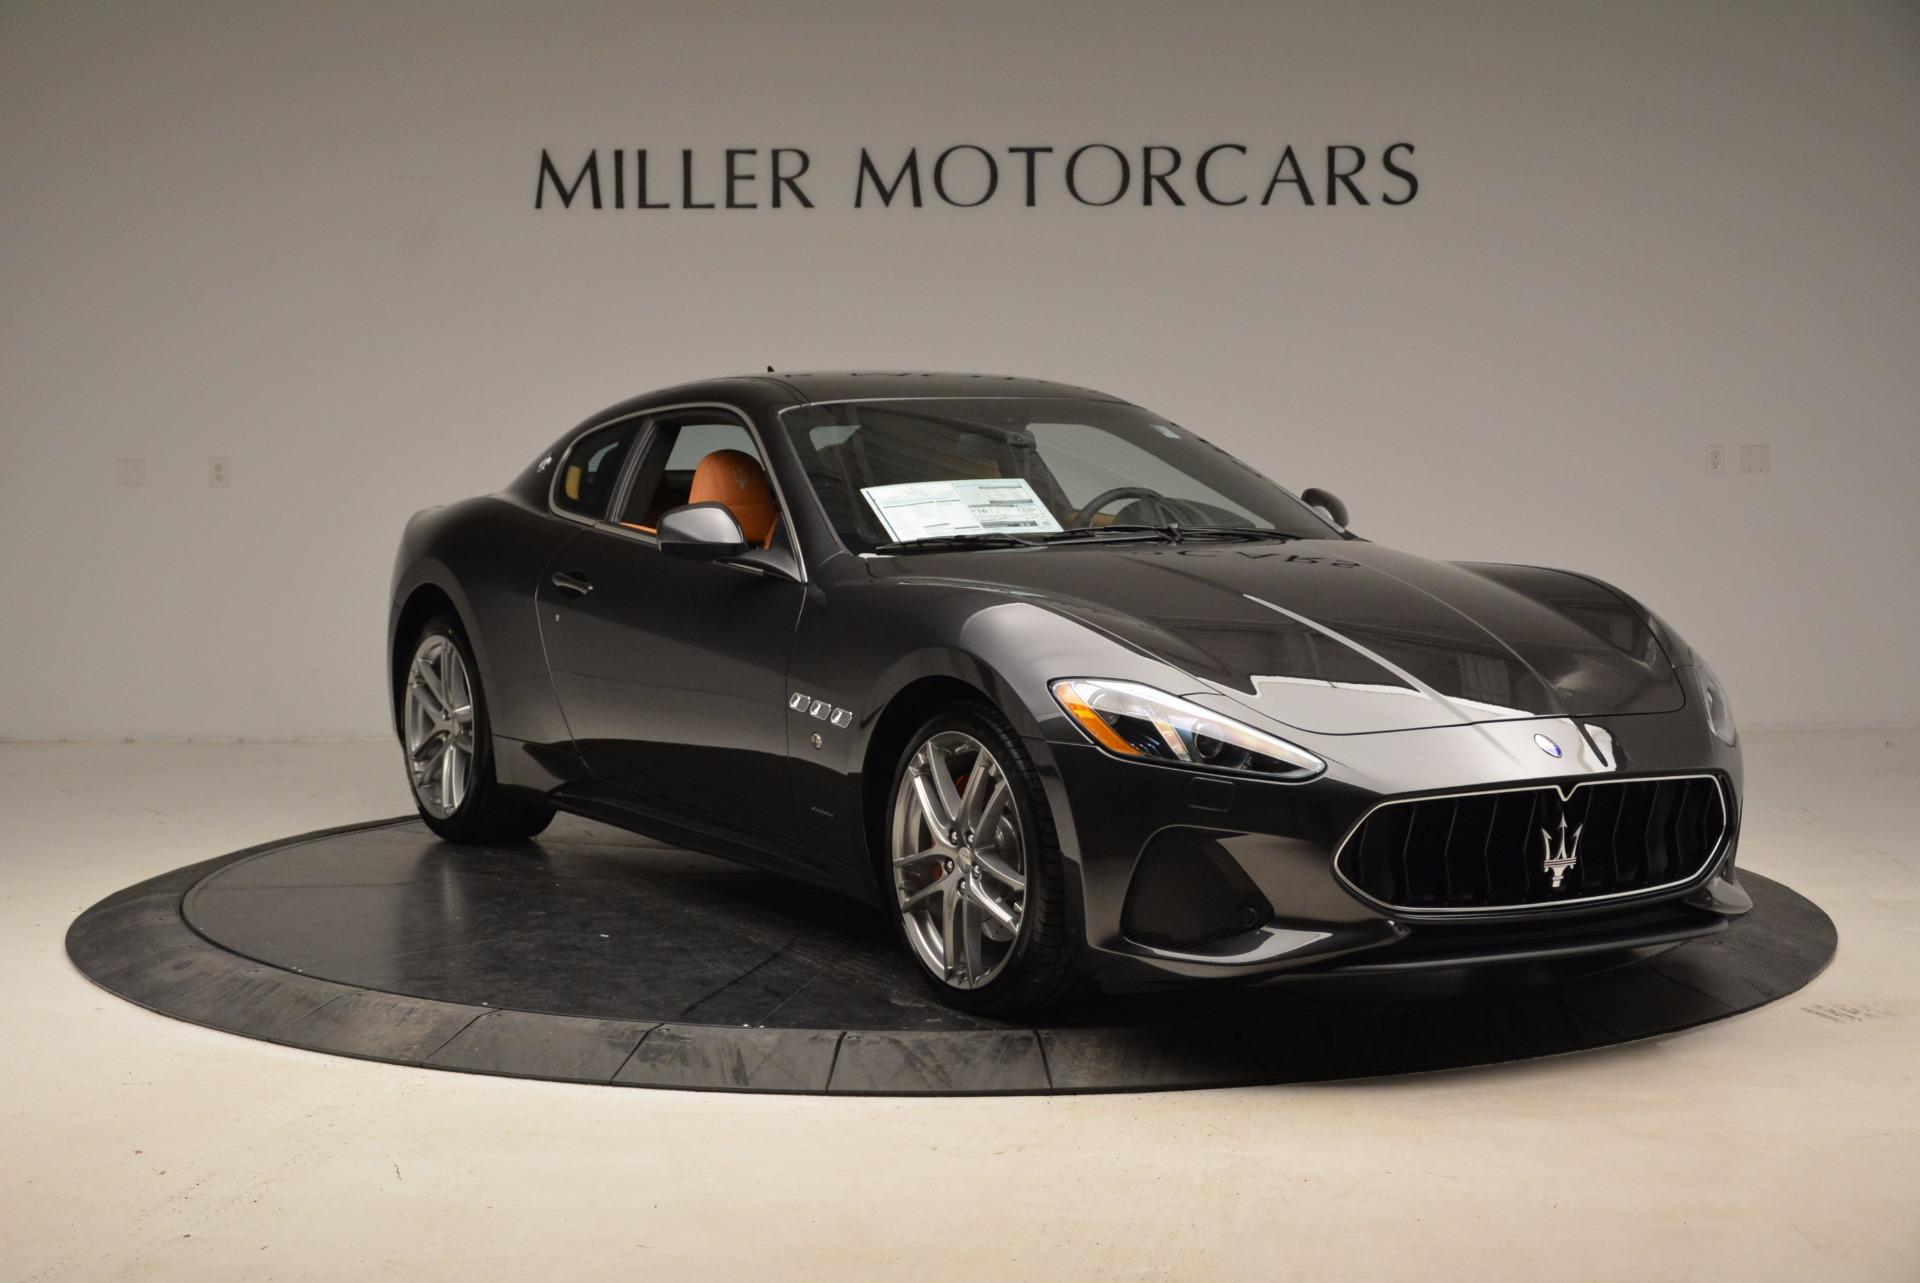 New 2018 Maserati GranTurismo Sport Coupe For Sale In Westport, CT 1771_p11